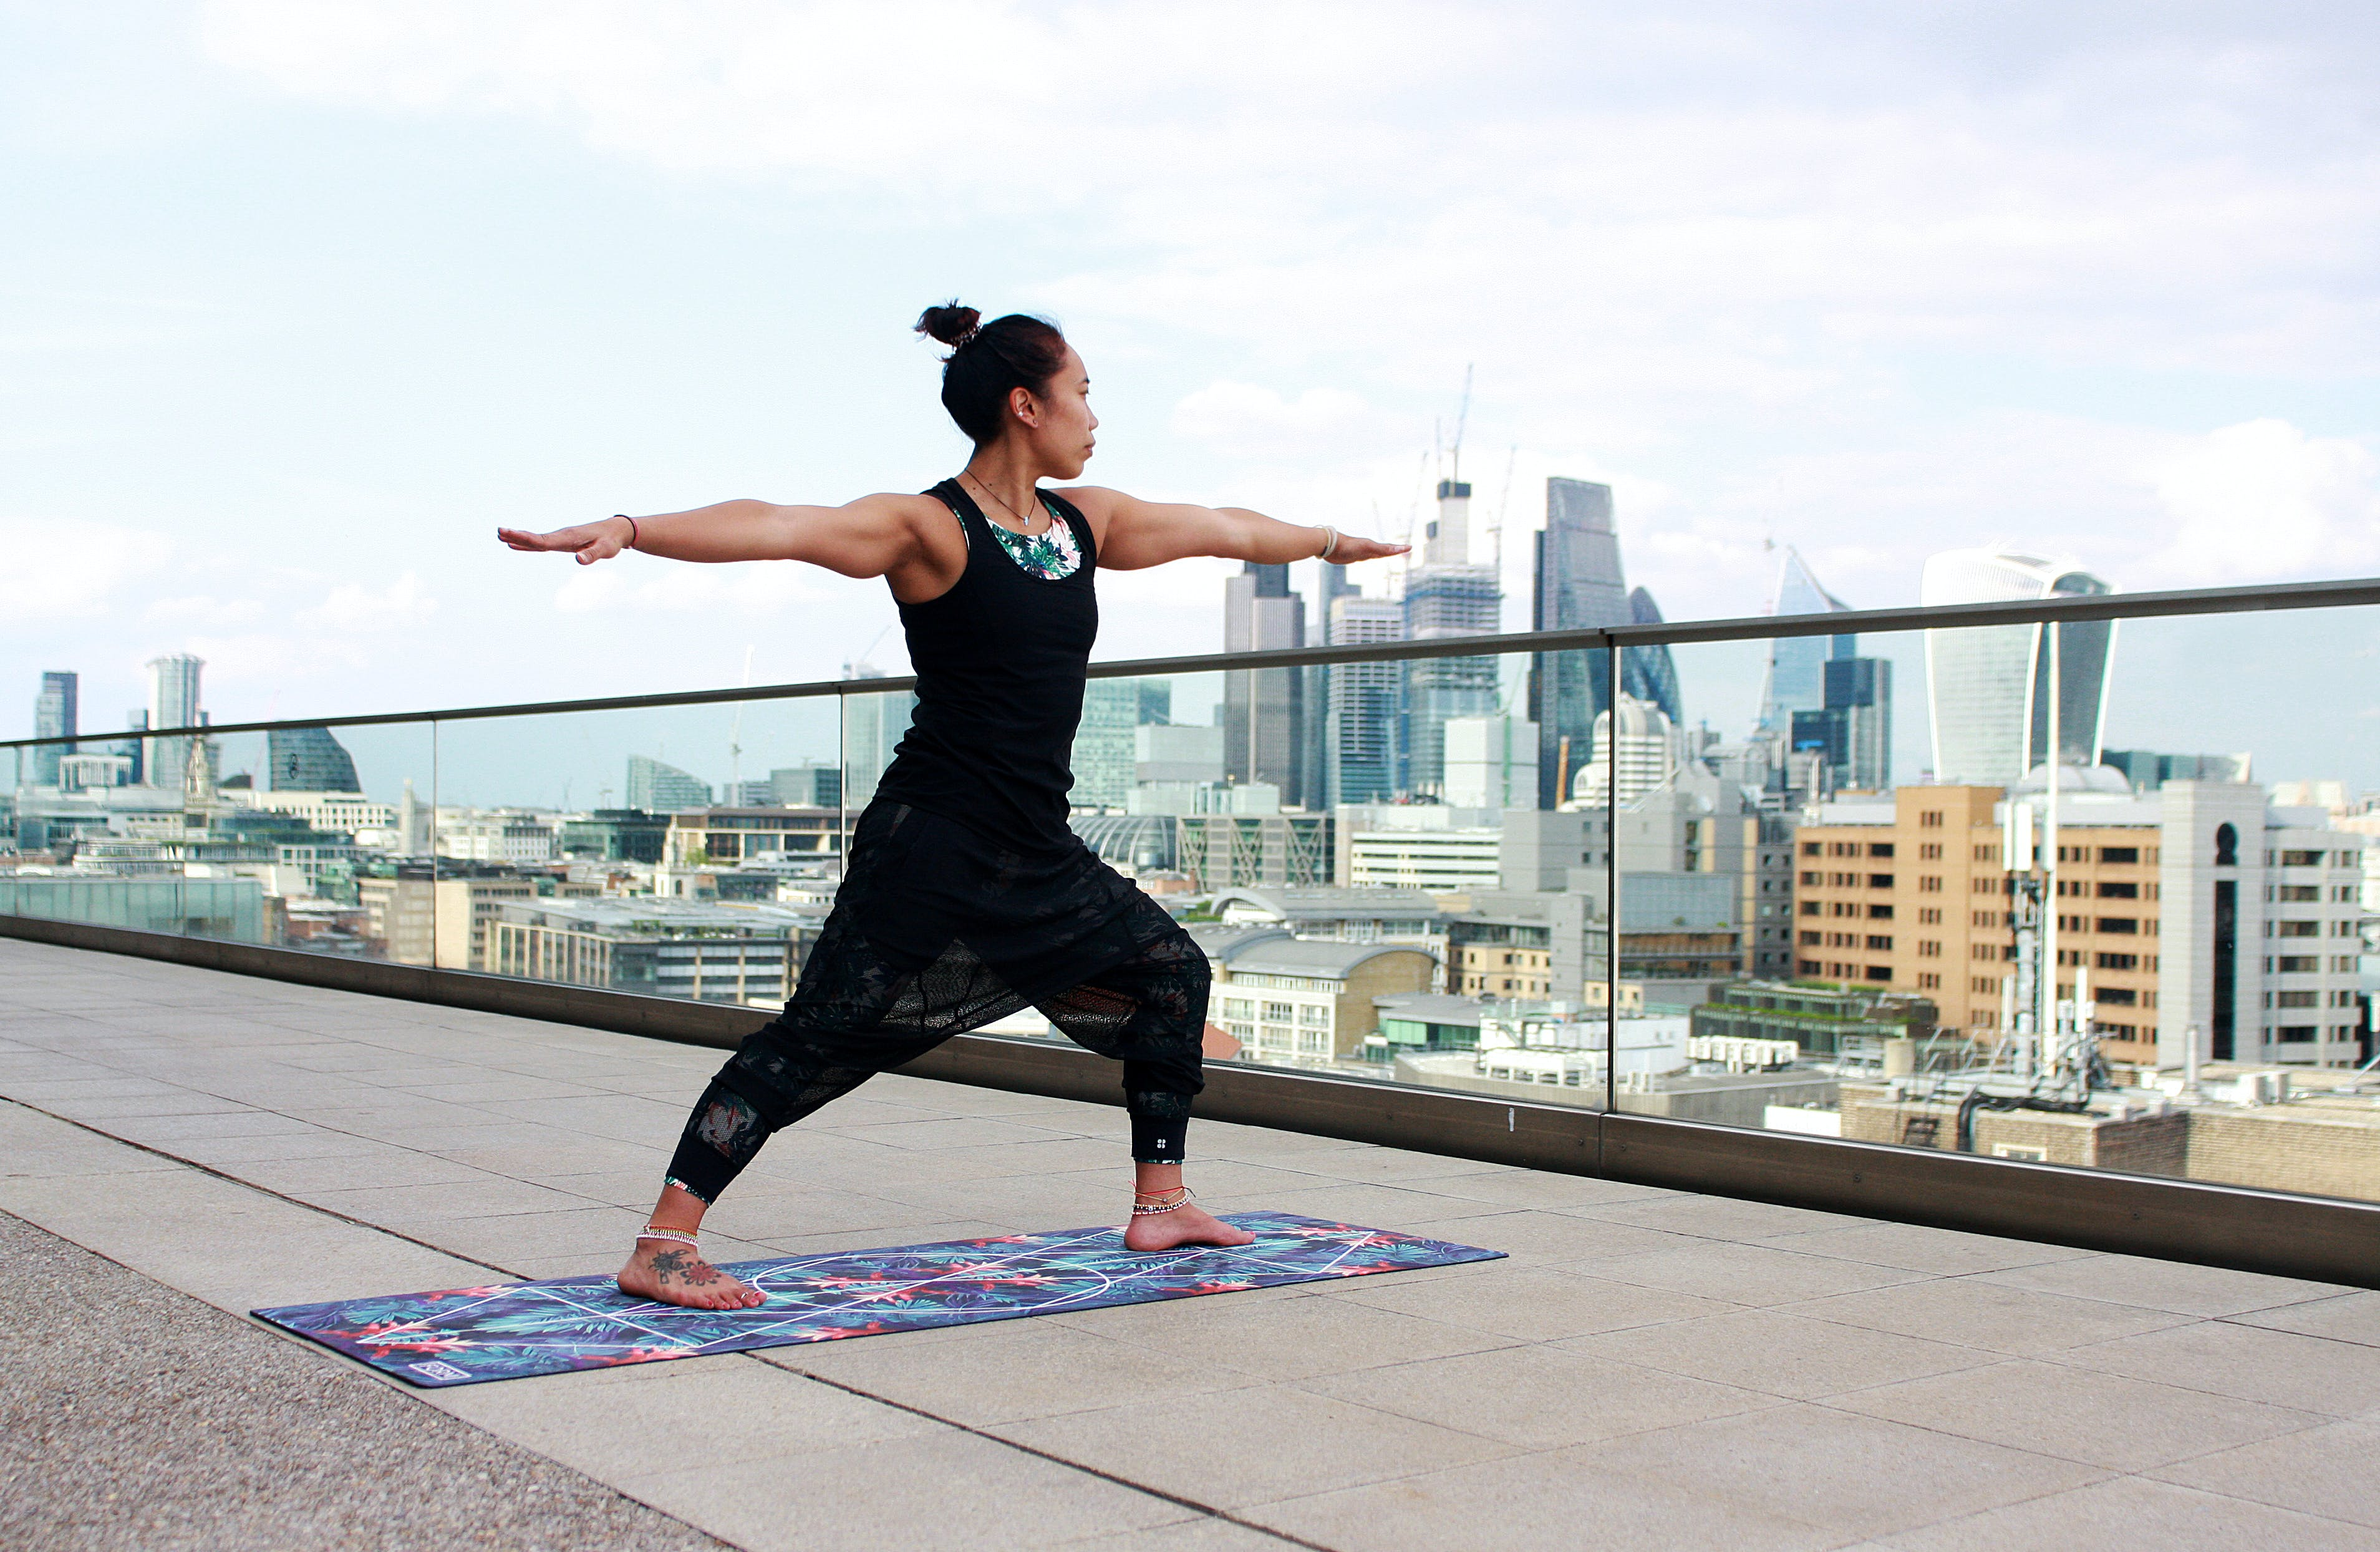 Kostnadsfri bild av acro, akro yoga, apelsin, arkitektur